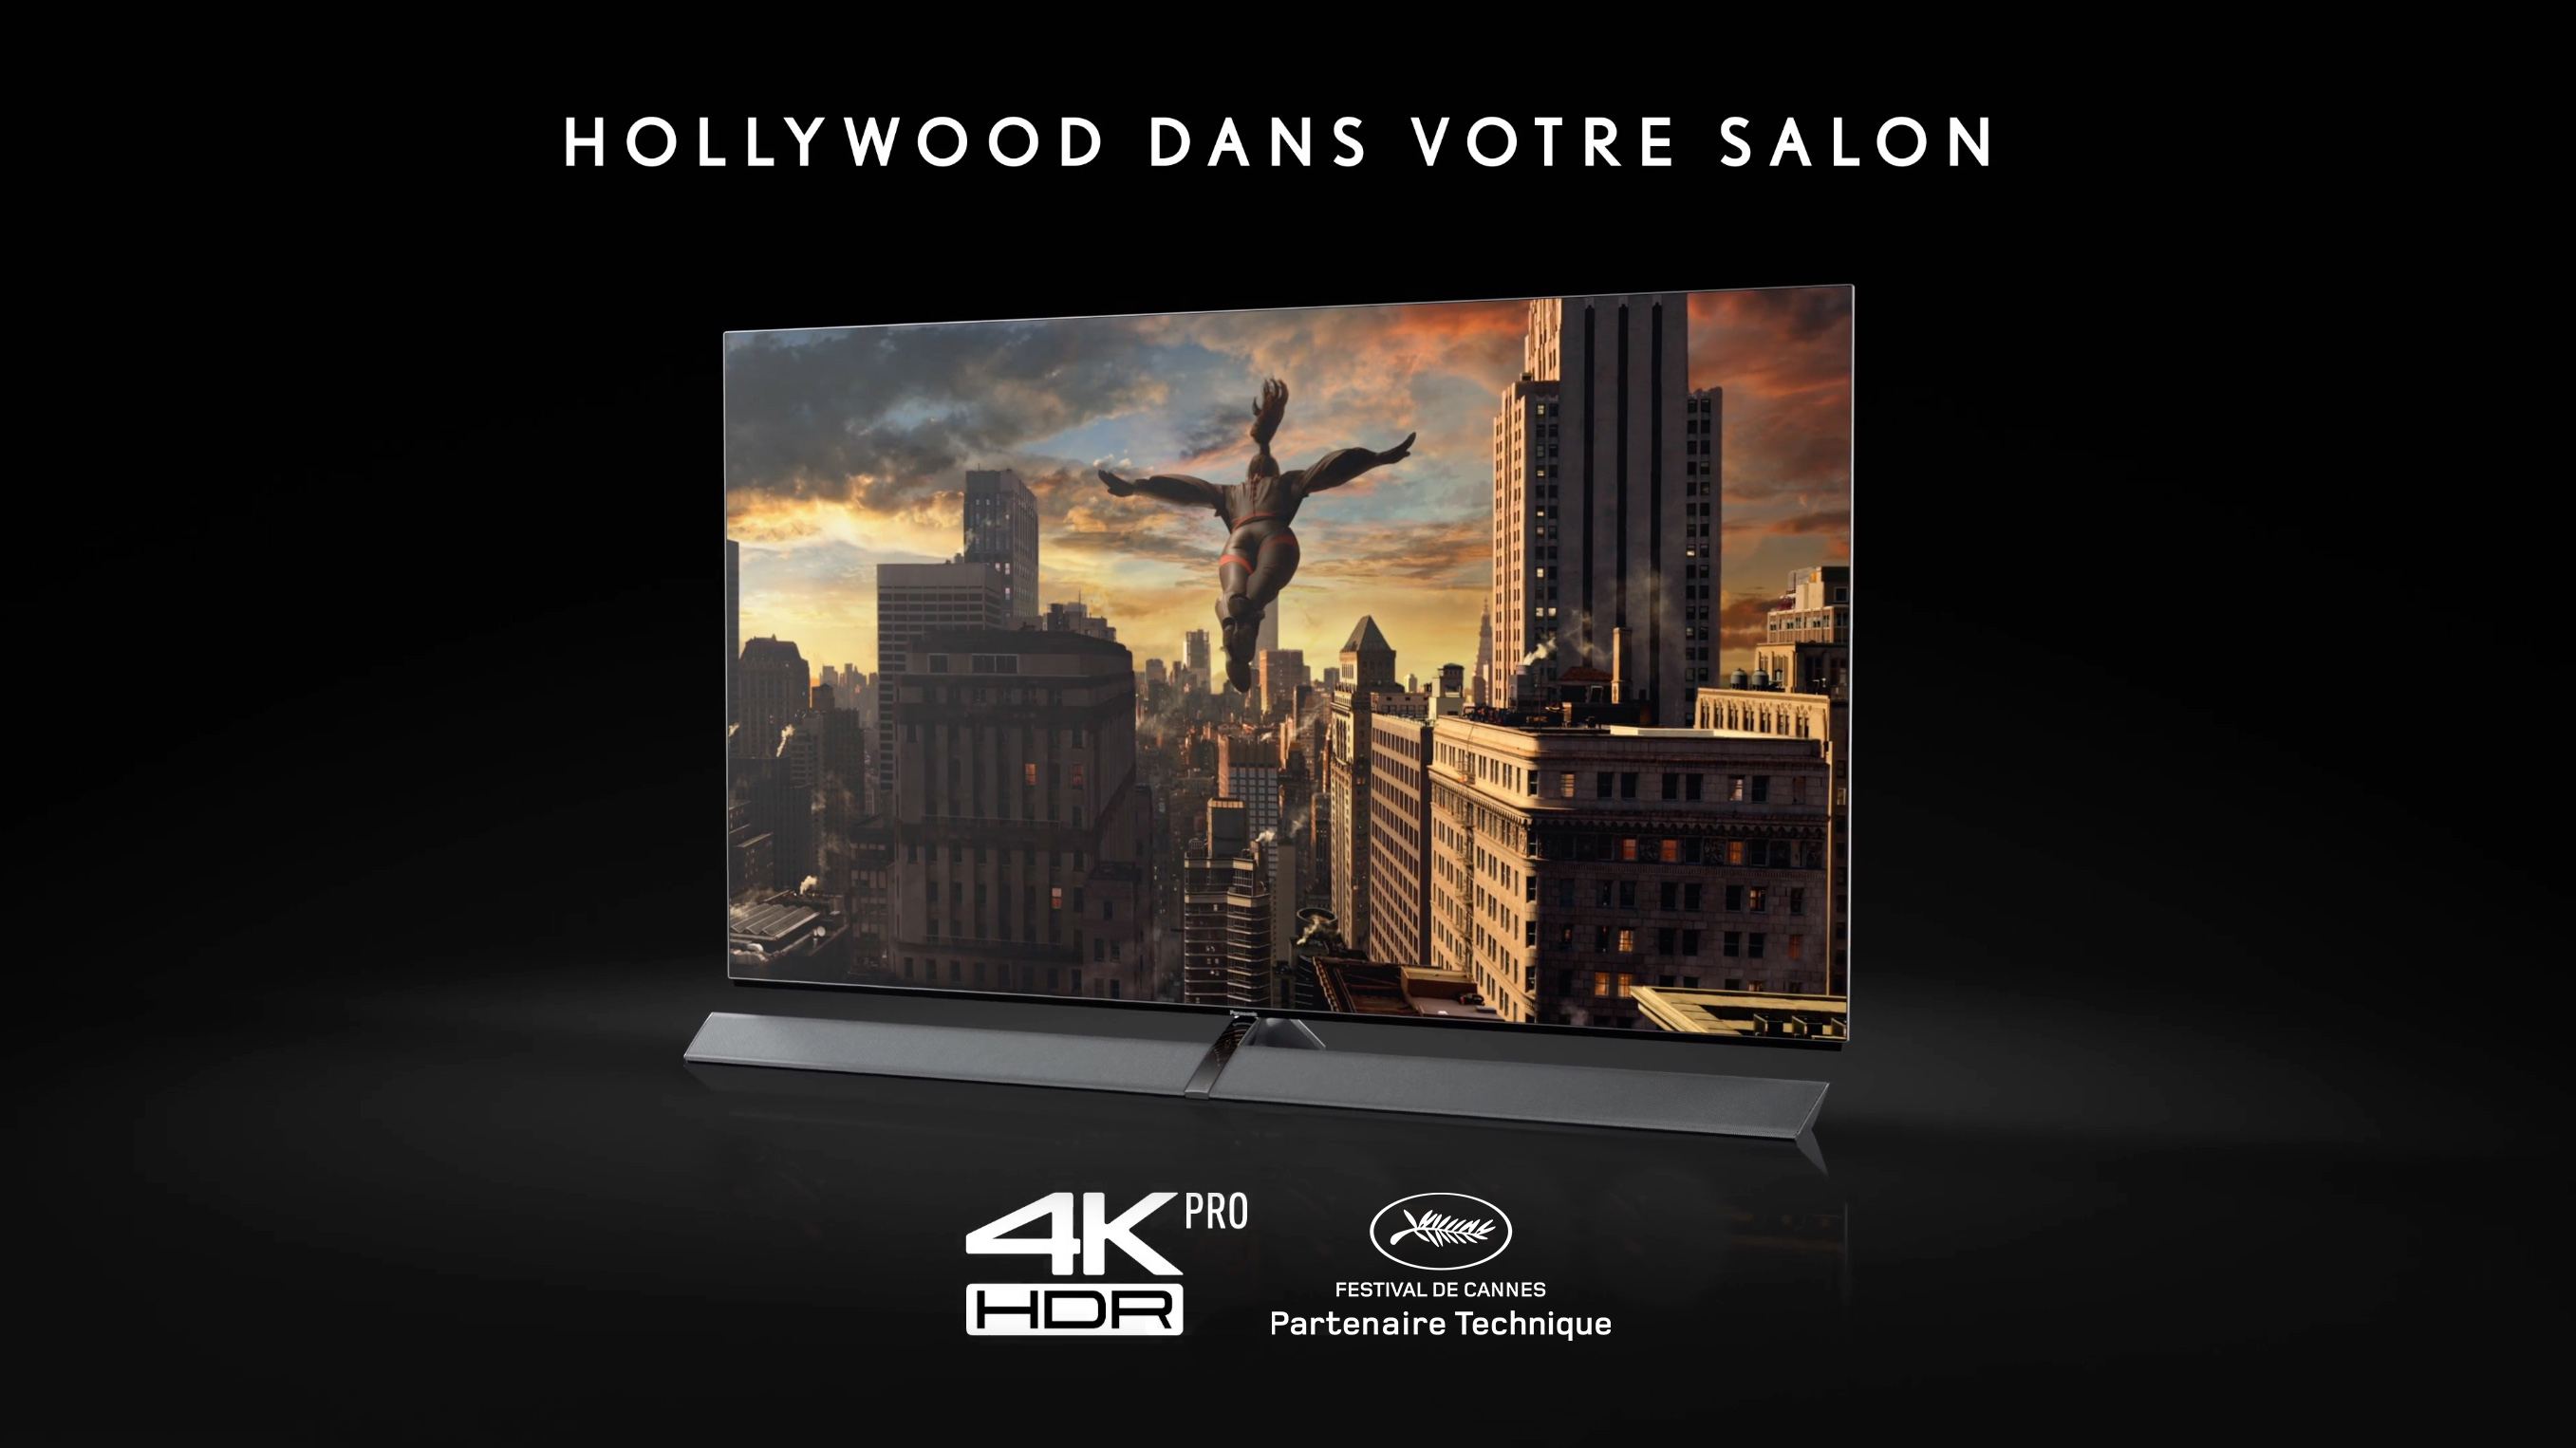 Panasonic – Partener tehnic oficial la Festivalul de Film de la Cannes